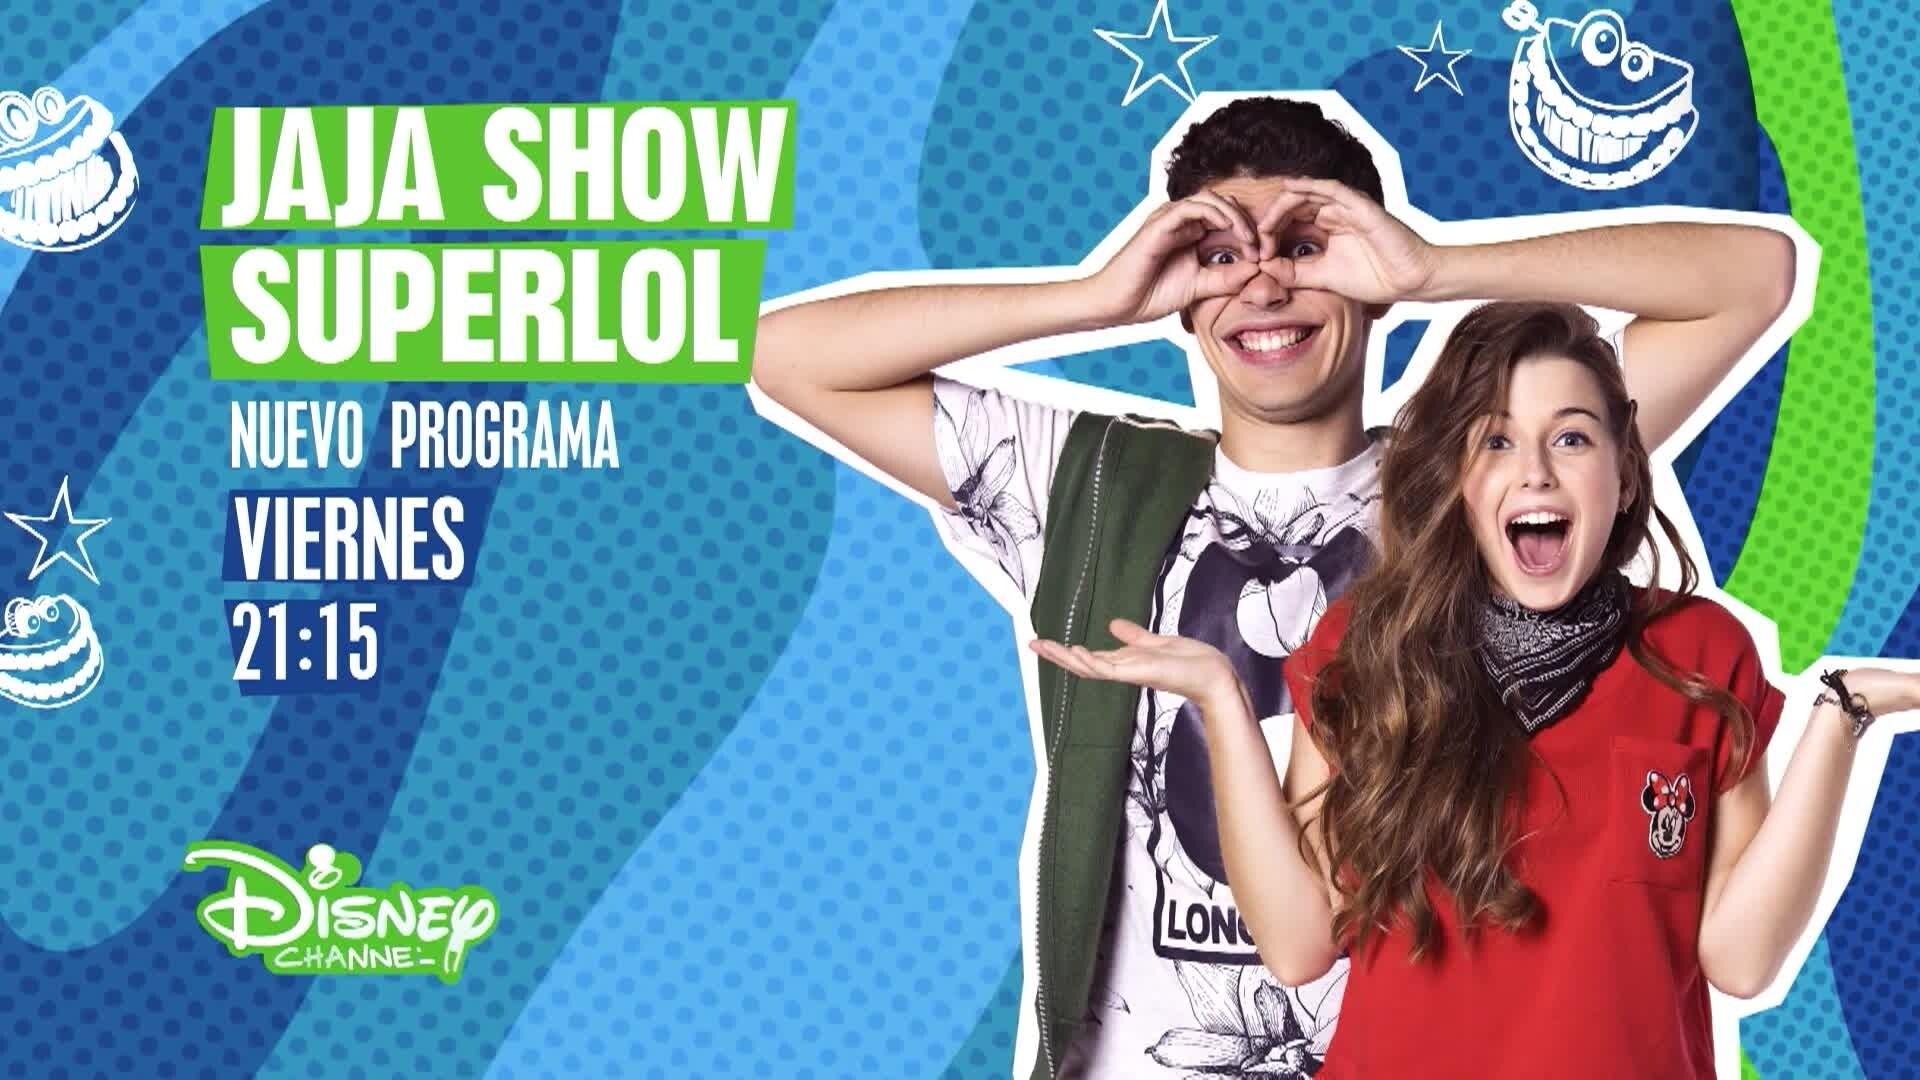 JaJa Show: Super LOL, nuevos programas